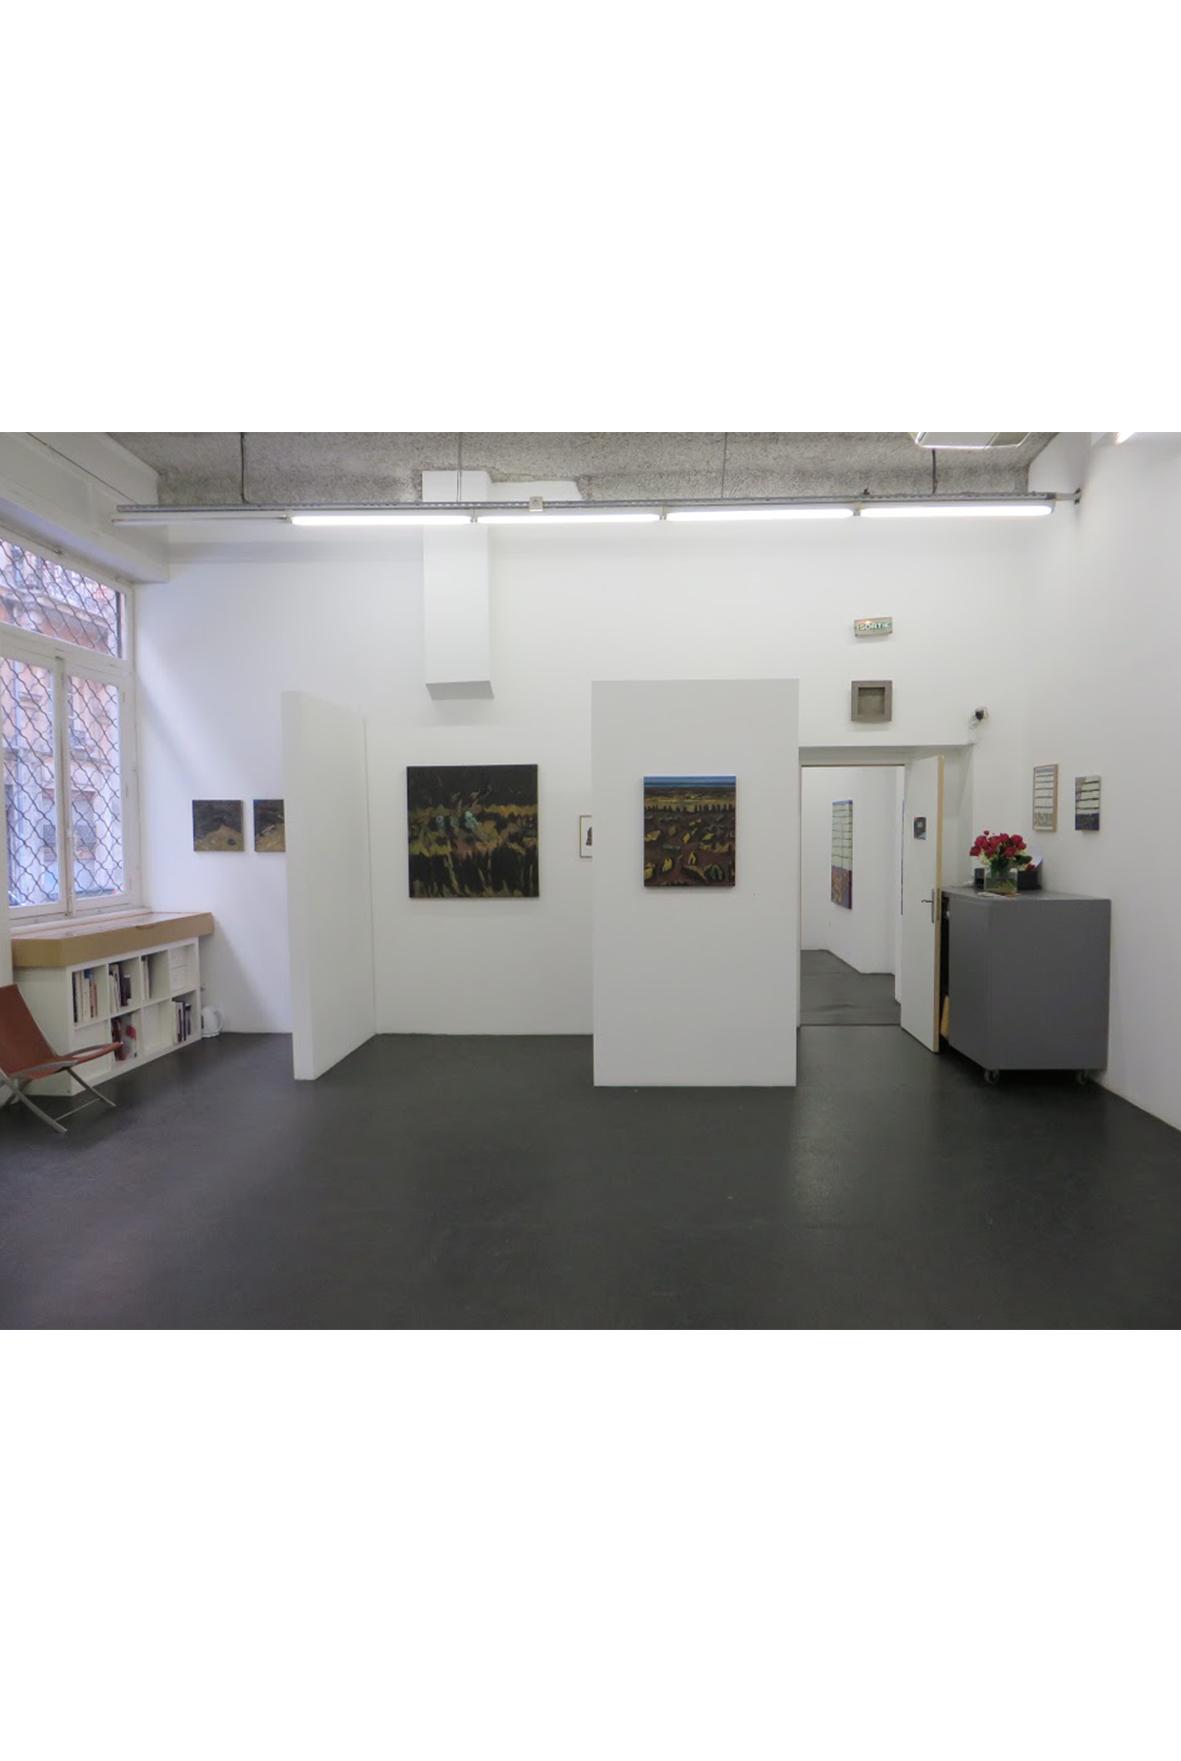 Guy de Malherbe, galerie d'art lyon, art contemporain lyon, galerie Lyon